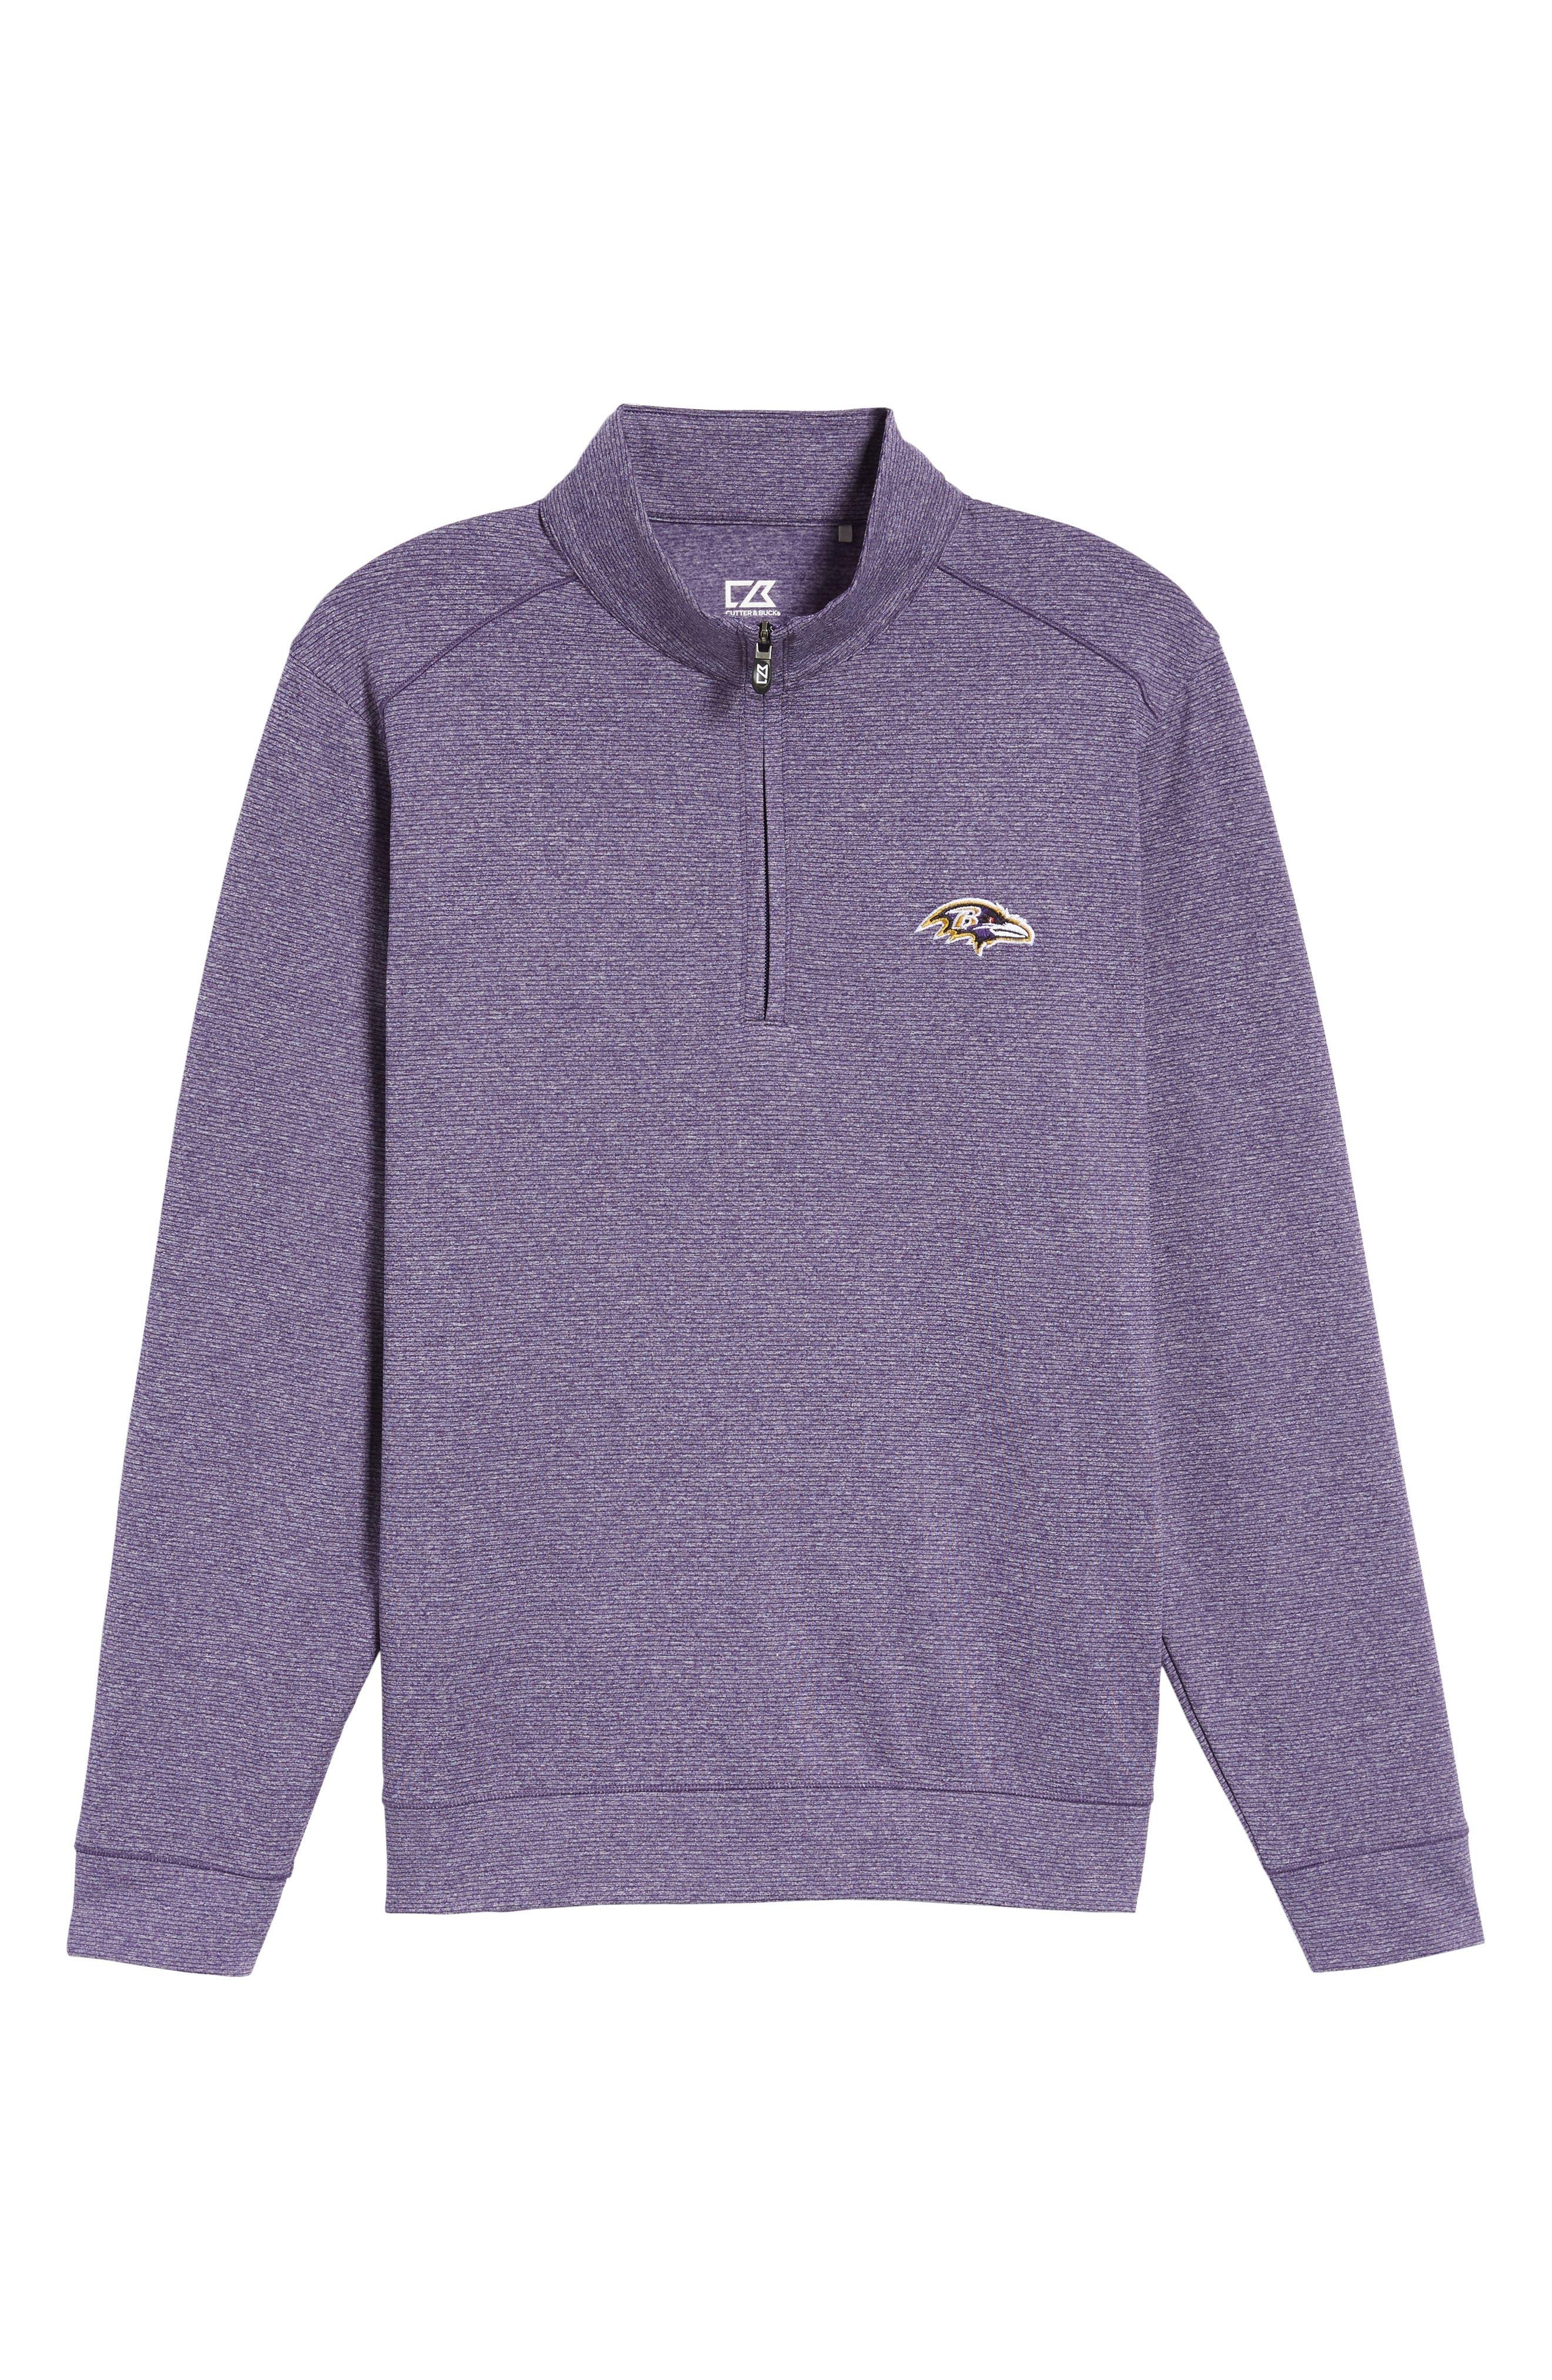 Shoreline - Baltimore Ravens Half Zip Pullover,                             Alternate thumbnail 6, color,                             513